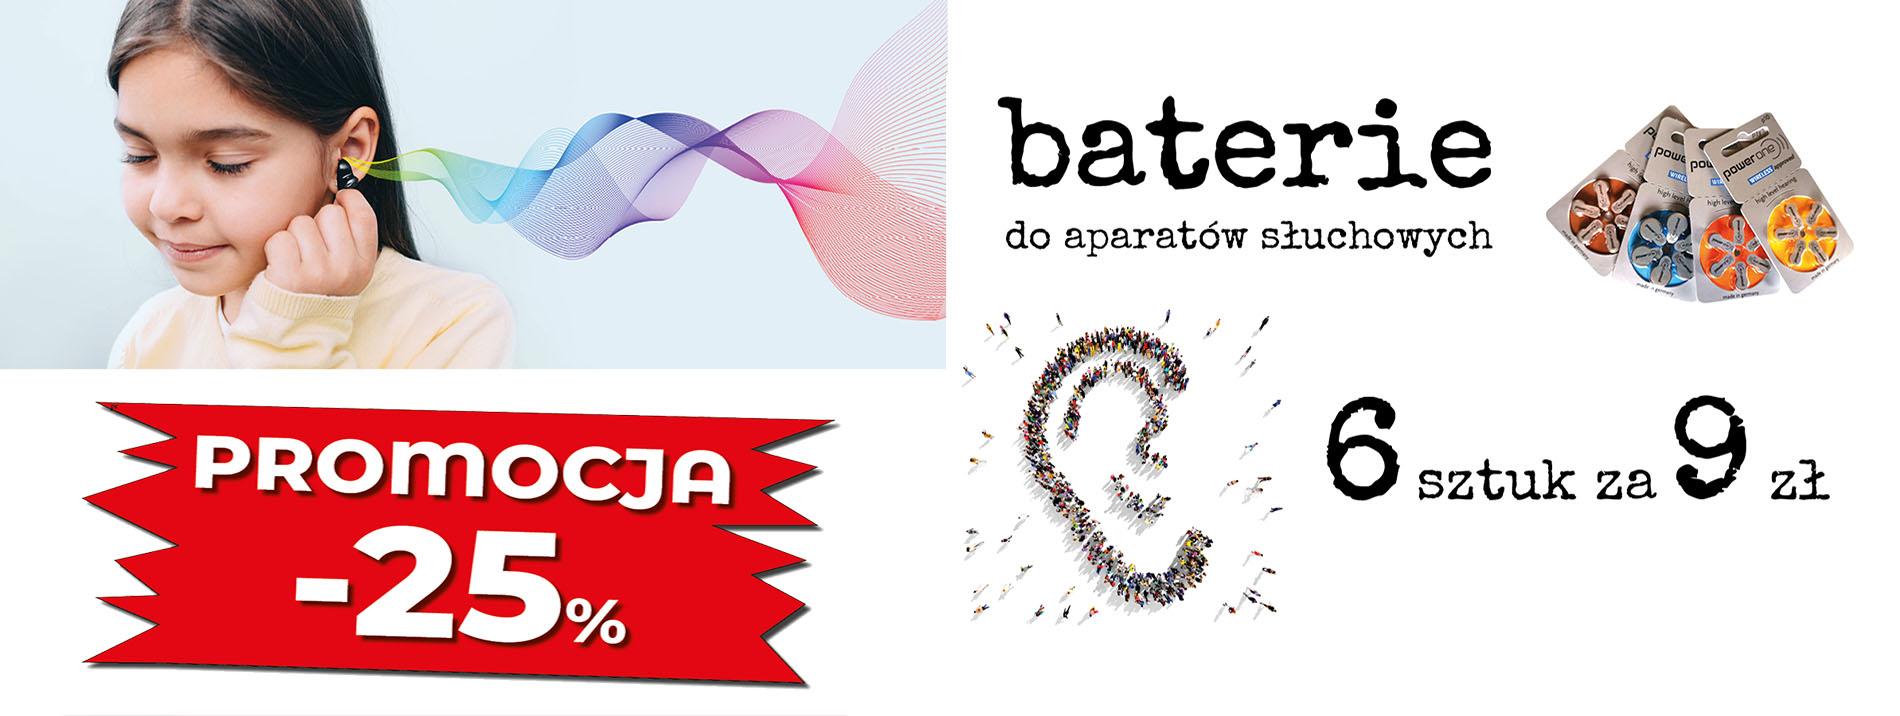 Plakat 01 baterie aparaty słuchowe toruń baner